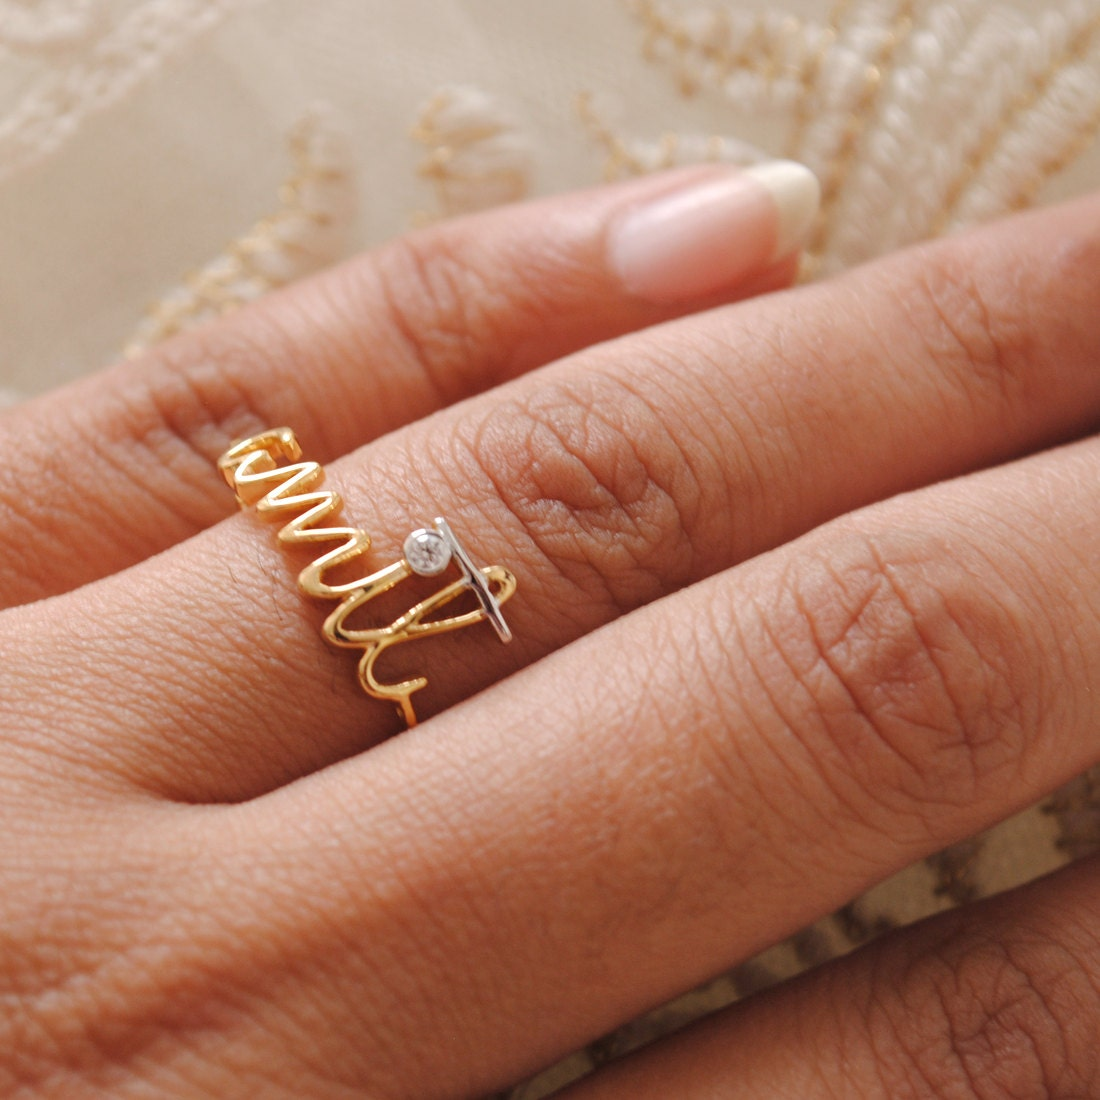 Custom Name 14k Yellow Gold Engagement Ring Gold & By. Cheap Simple Engagement Engagement Rings. Amazing Wedding Rings. Garnet Side Stone Wedding Rings. Kid Wedding Rings. 4 Prong Engagement Rings. Shoe Engagement Rings. Pear Rings. Large Finger Wedding Rings